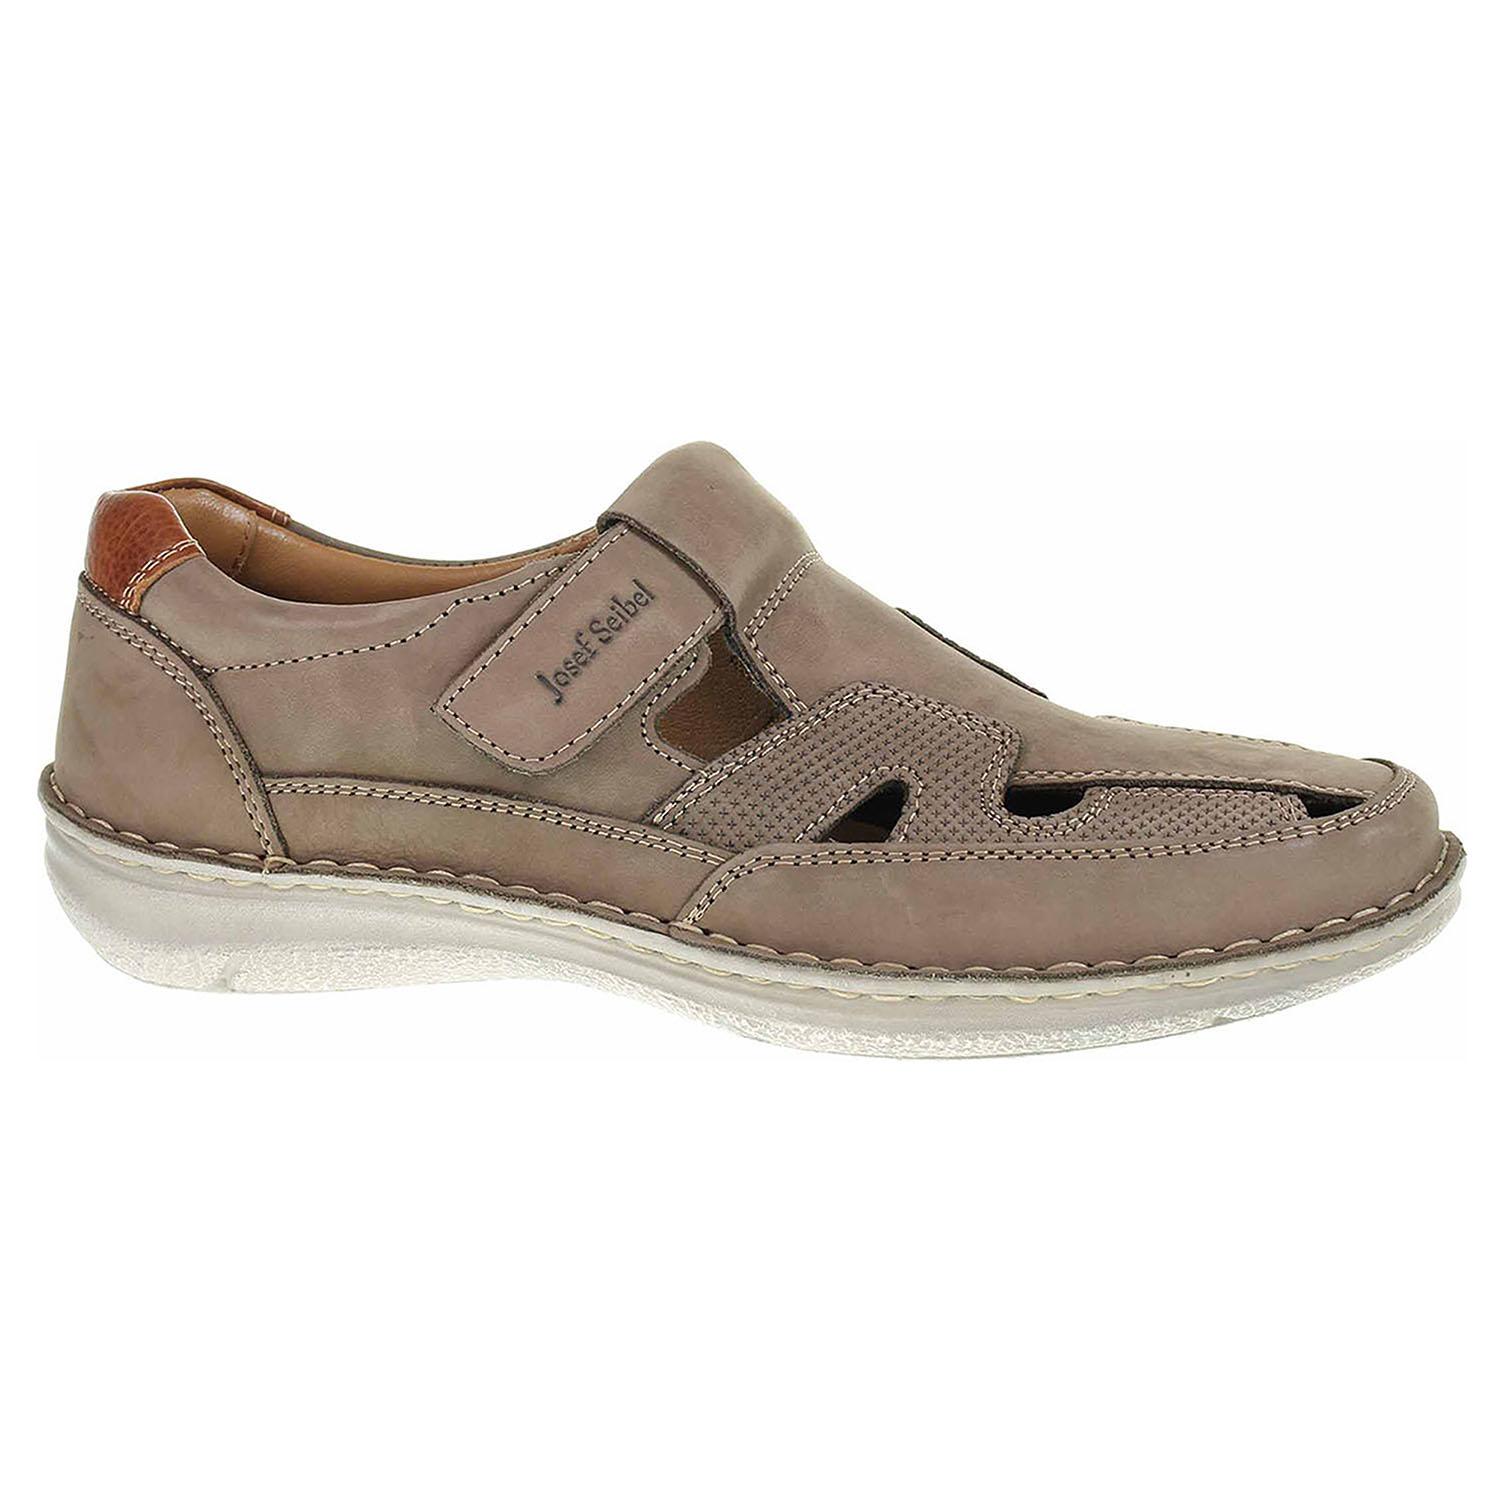 Pánské sandály Josef Seibel 43635 81710 grau 43635 81710 45